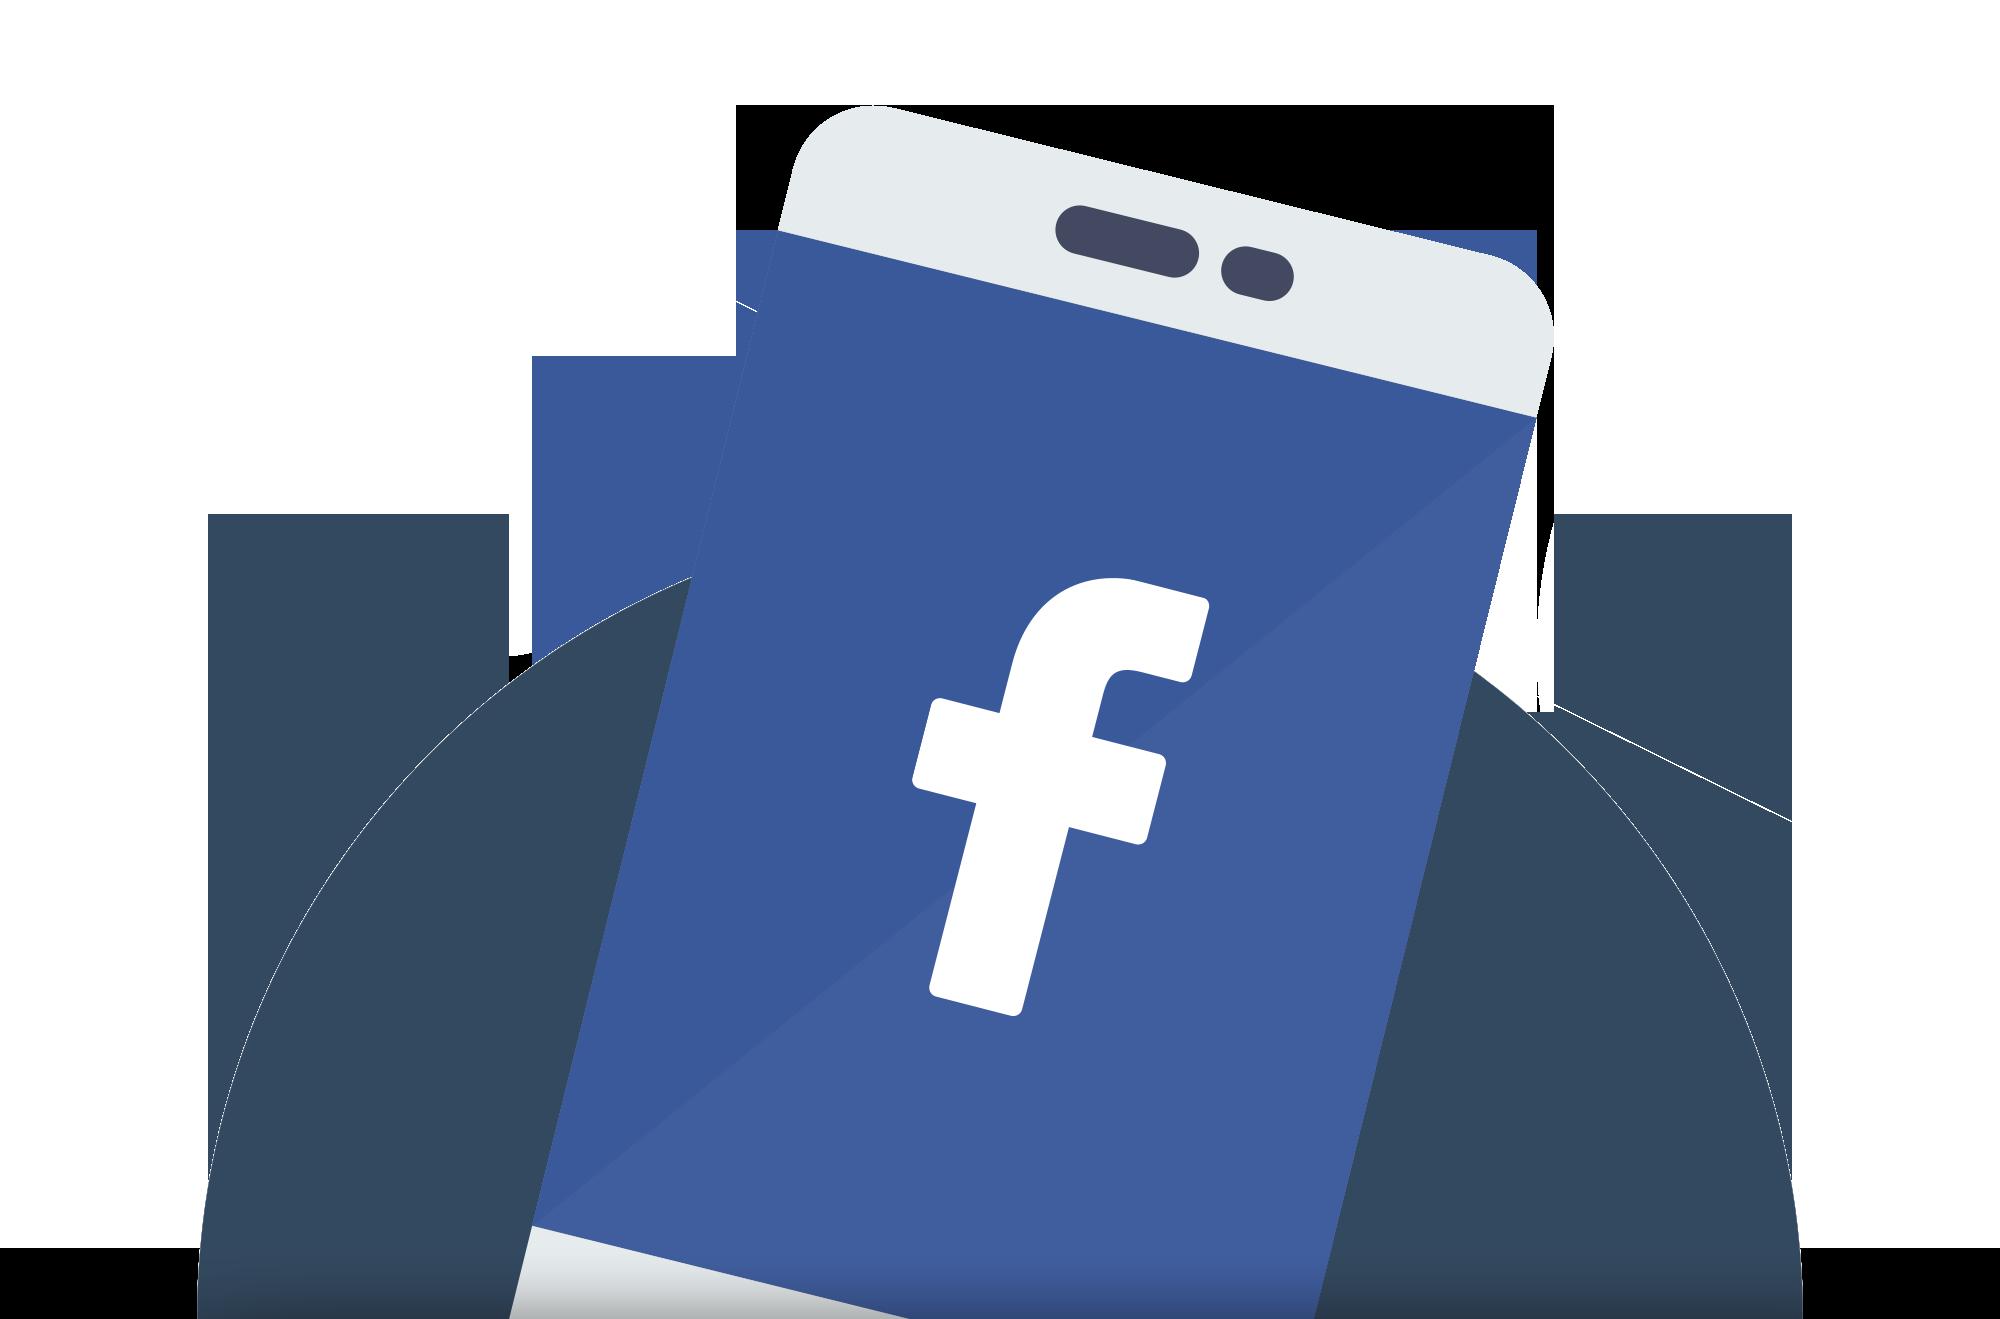 Sociale medier - Facebook annoncering